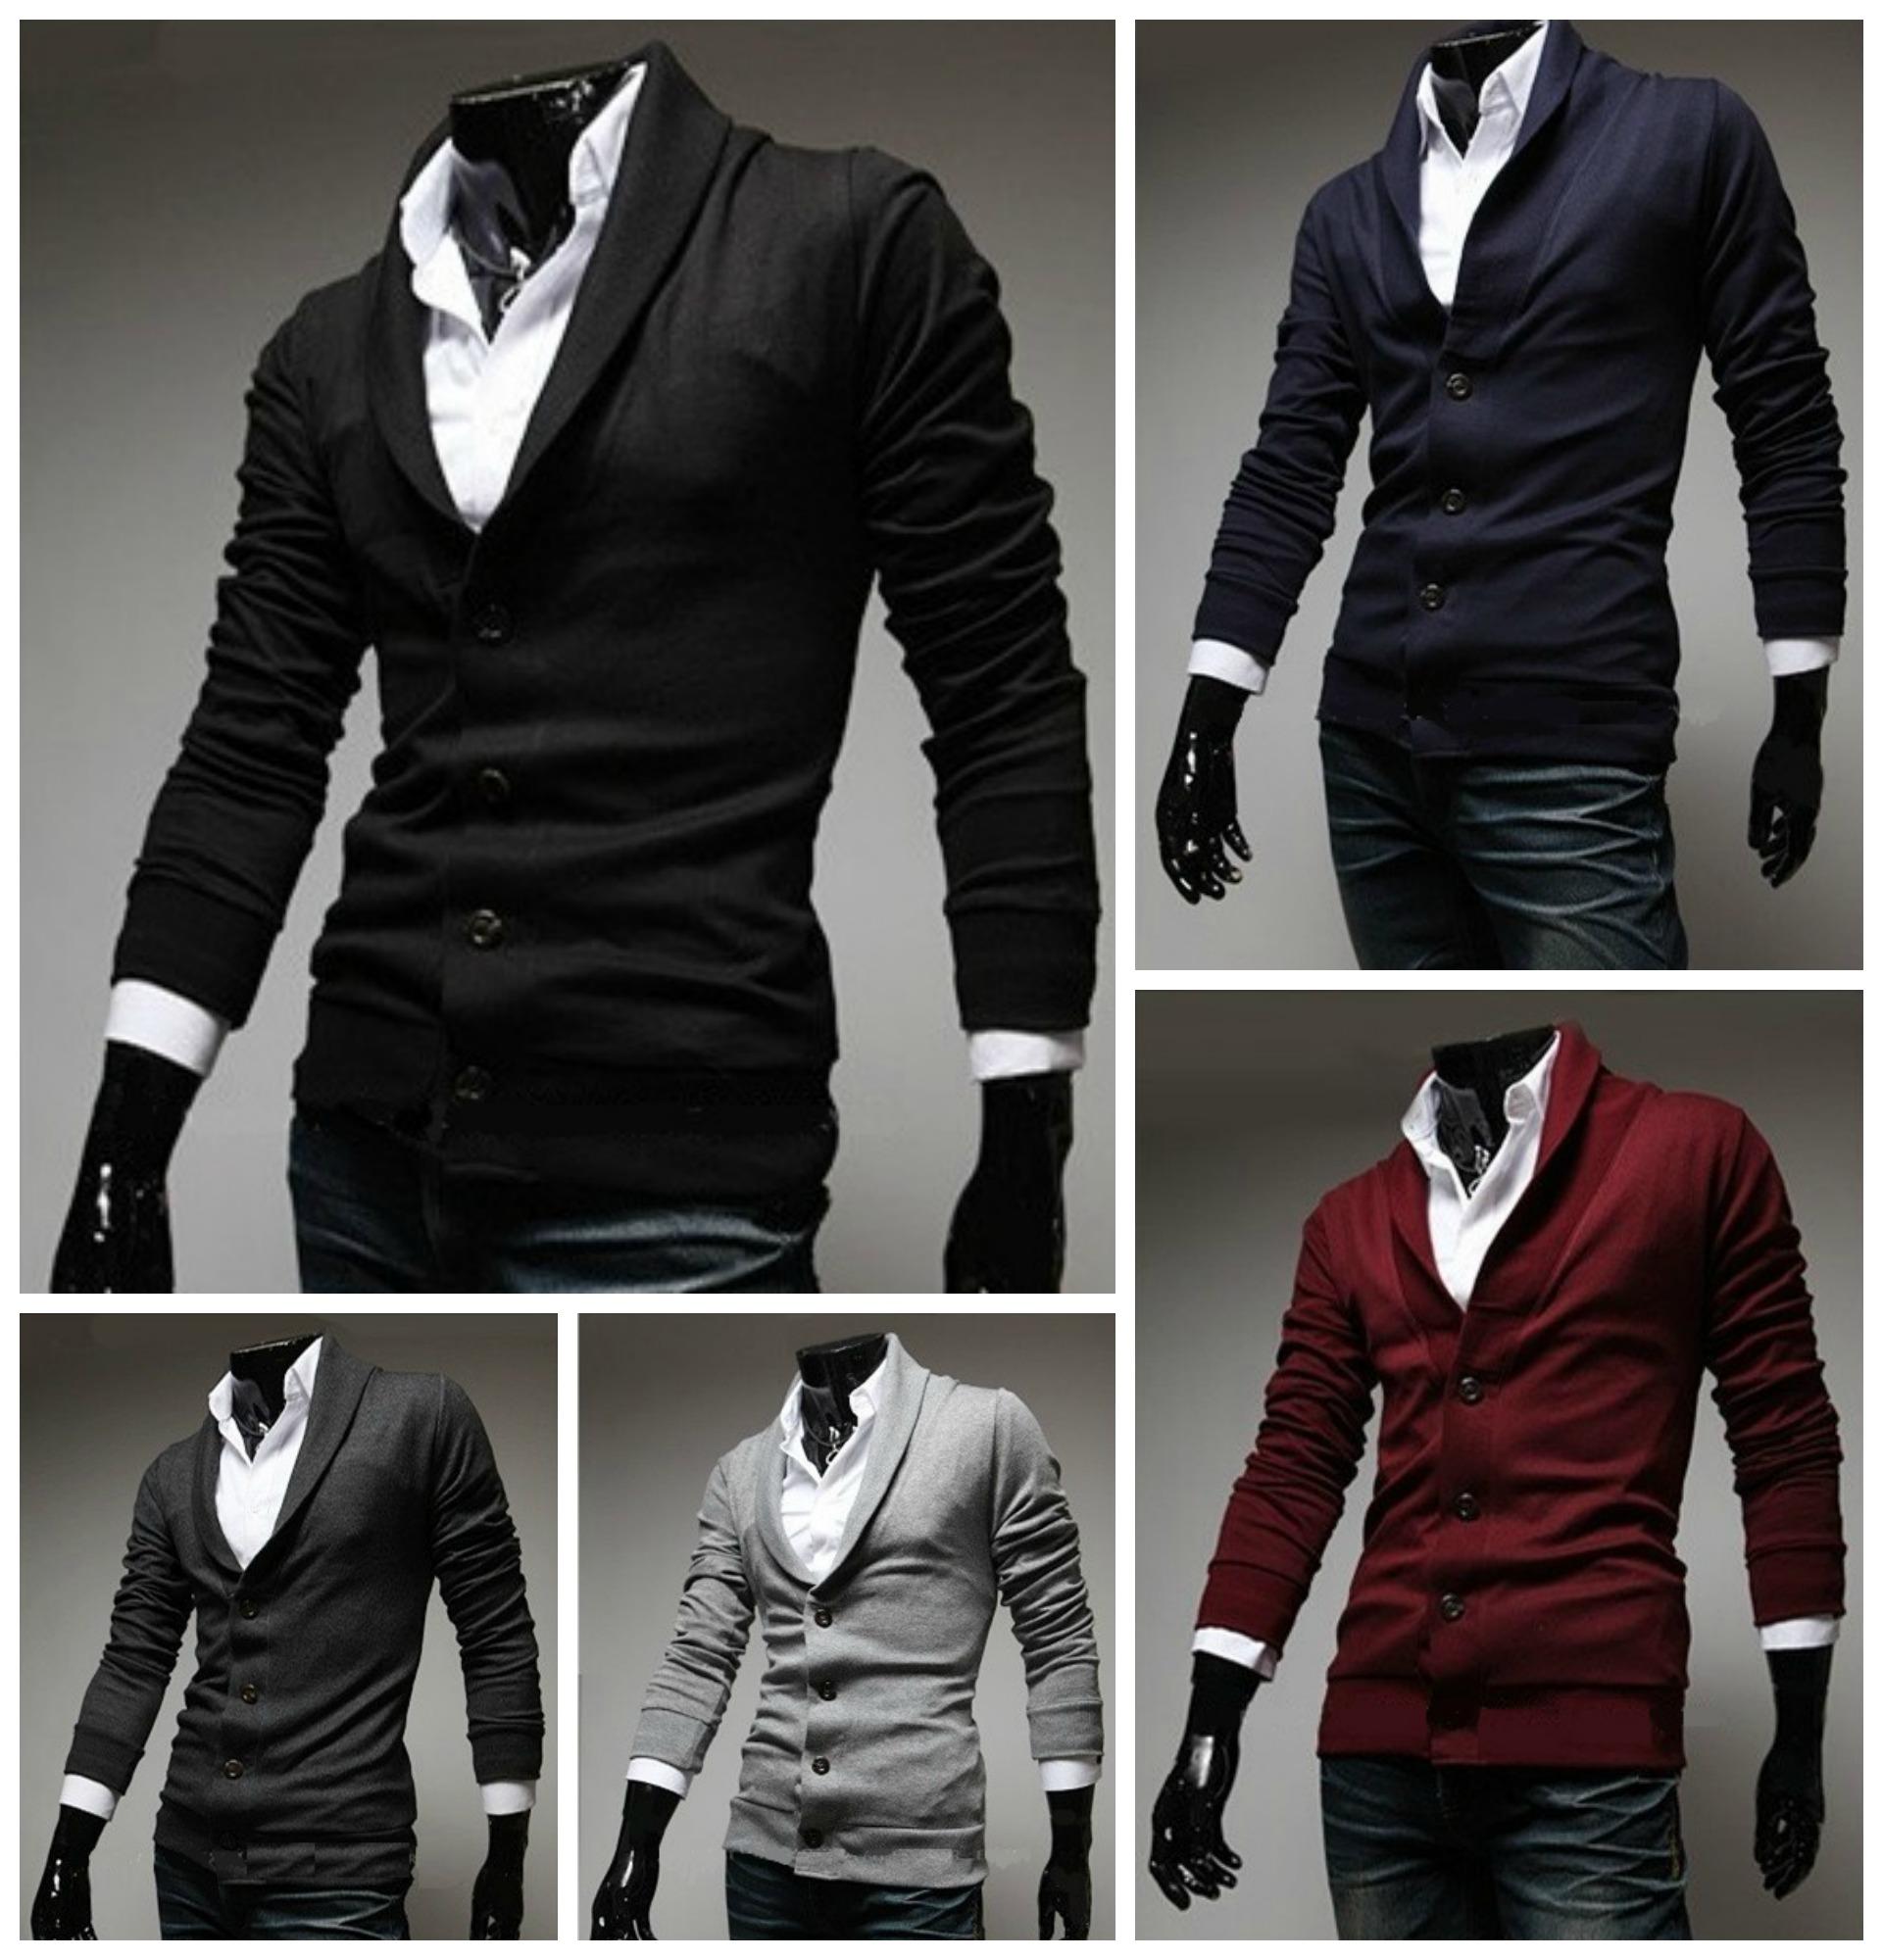 2c92aa565d4a5 Saco Fashion Slim Fit Tejido - Cuello Alto Moderno - Rojo